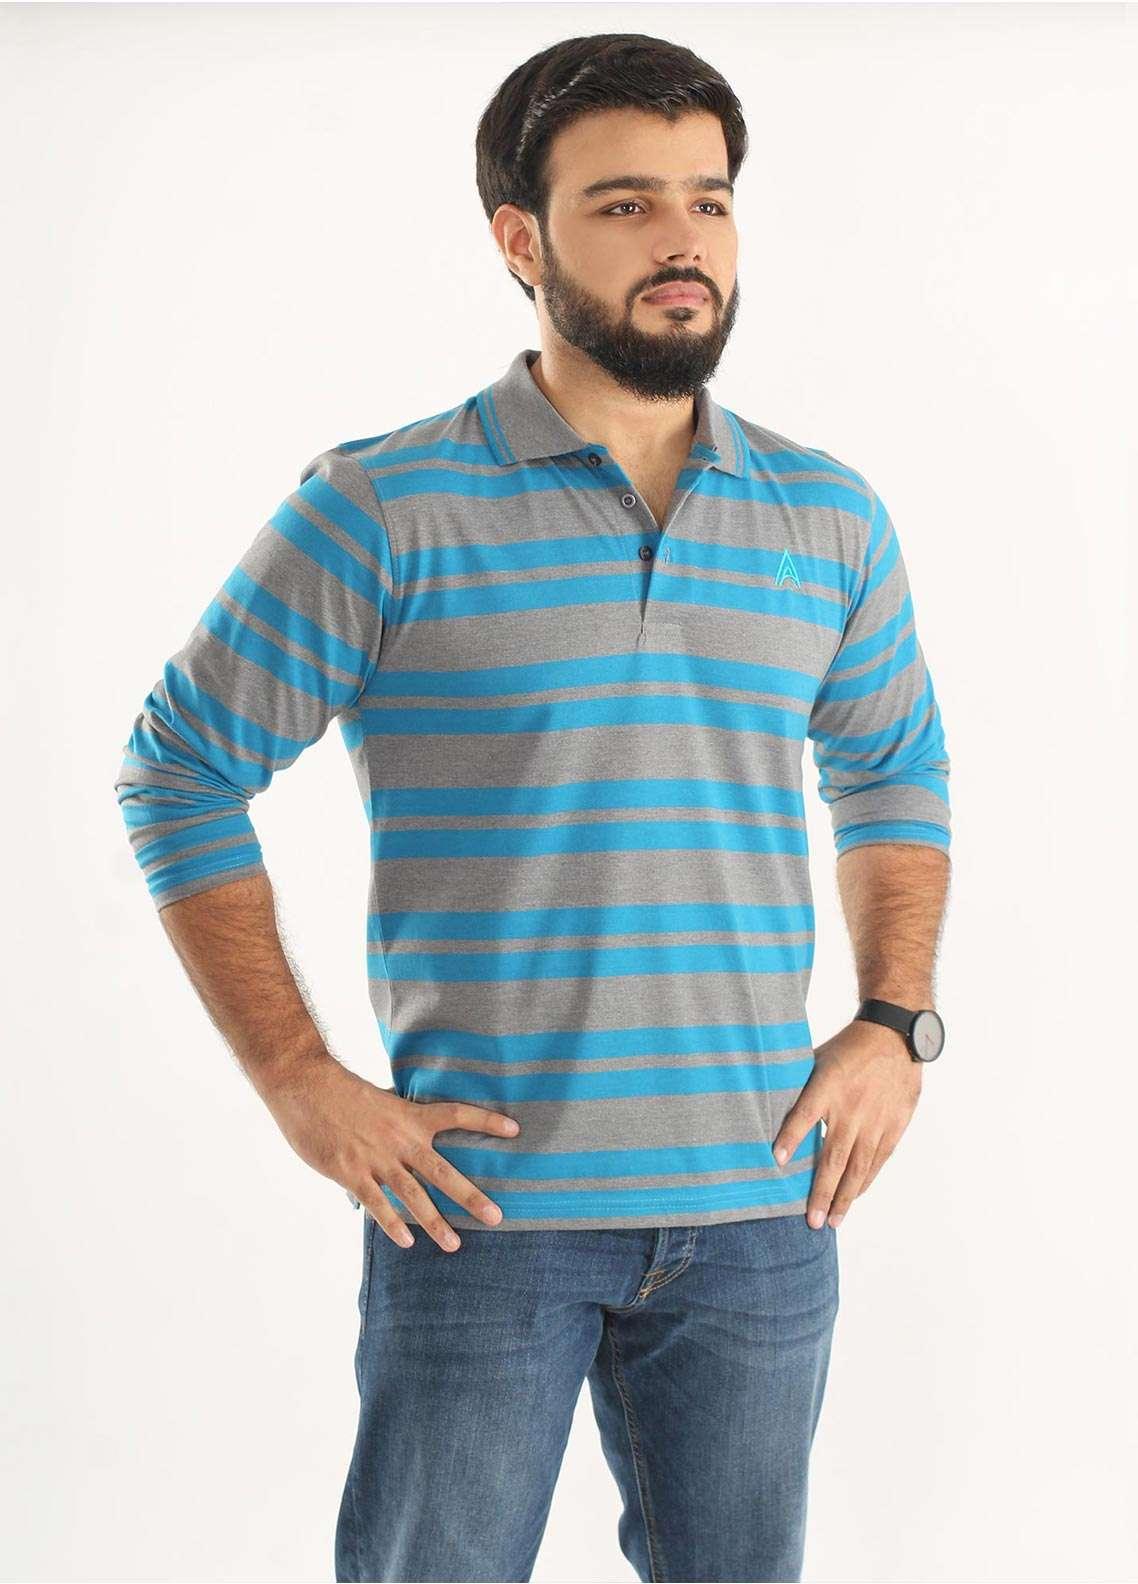 Anchor Jersey Polo Men T-Shirts - Multi A-221